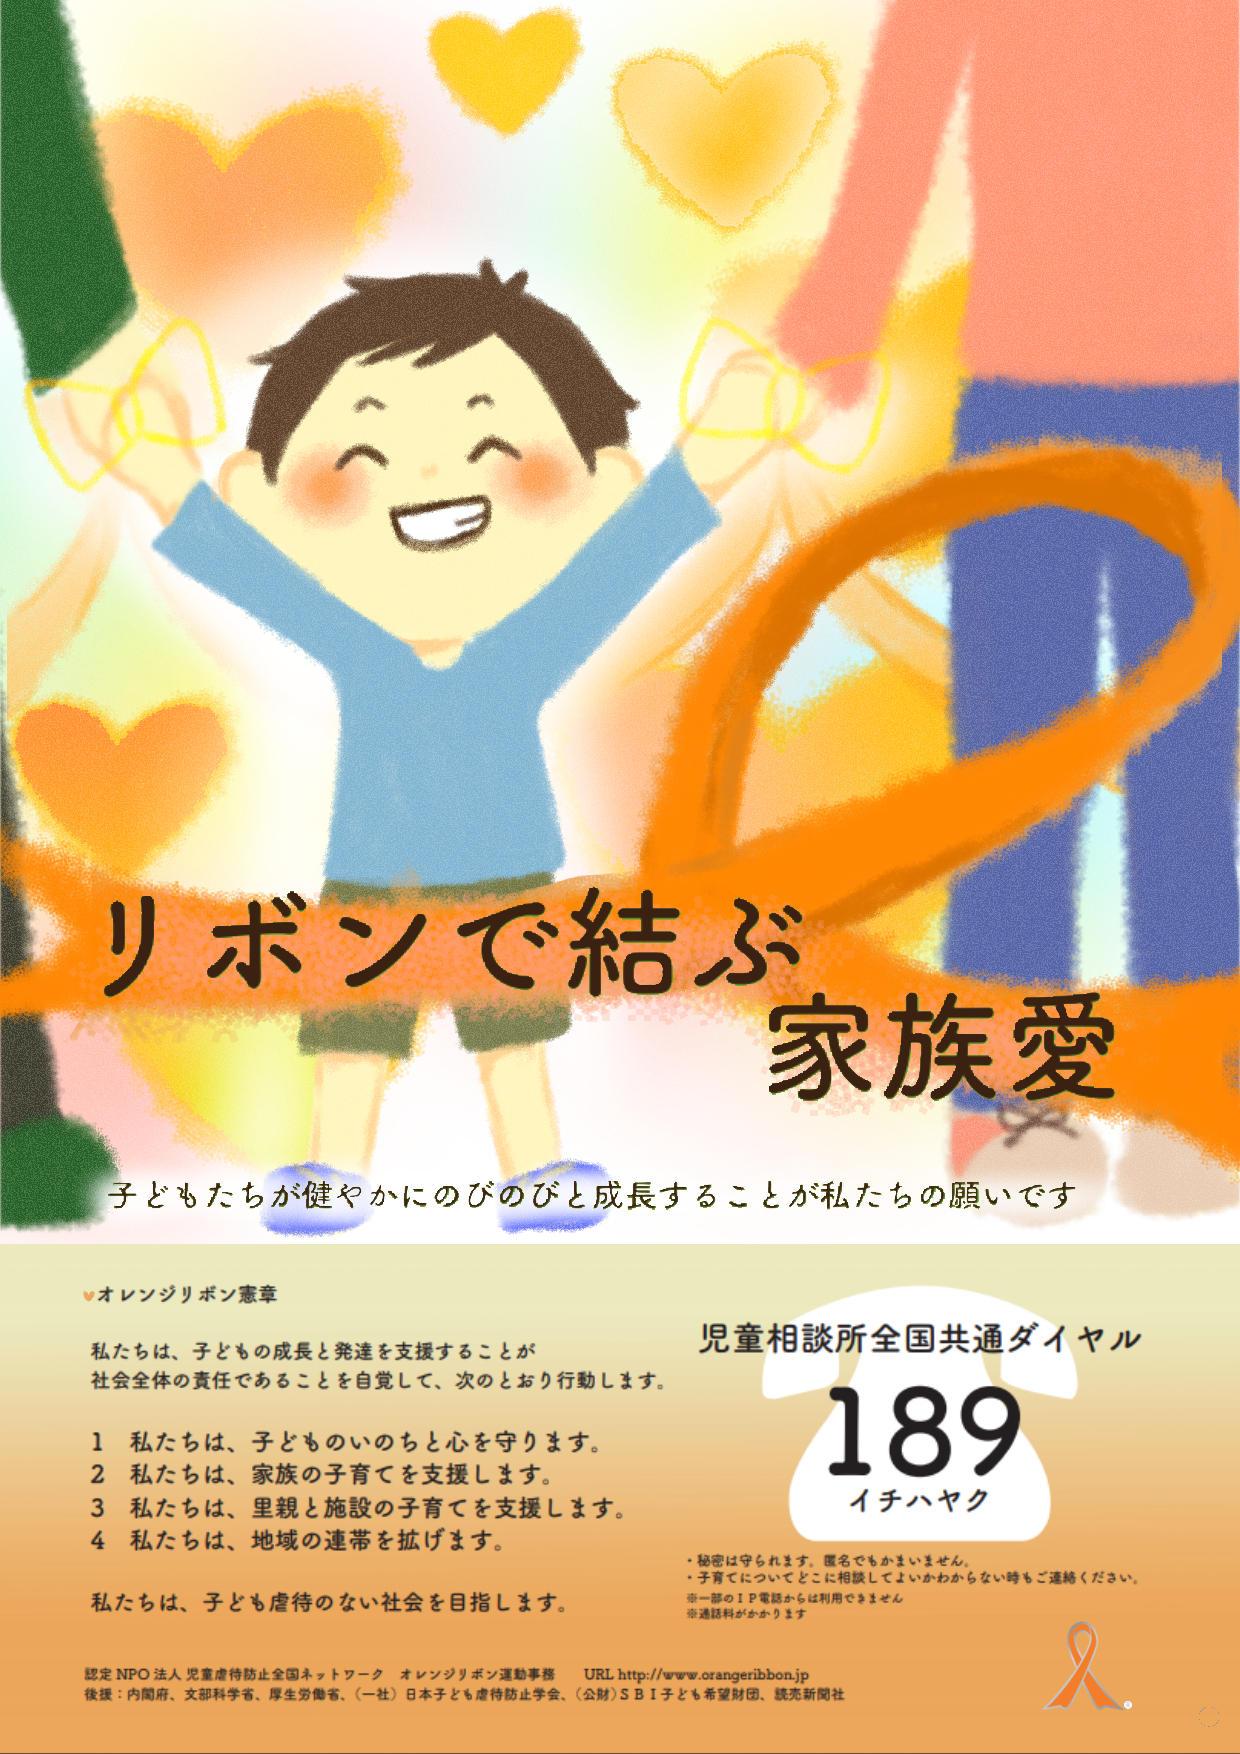 http://www.orangeribbon.jp/info/npo/e75b2151073f8365f227484338d009fd8cdc39bf.jpg